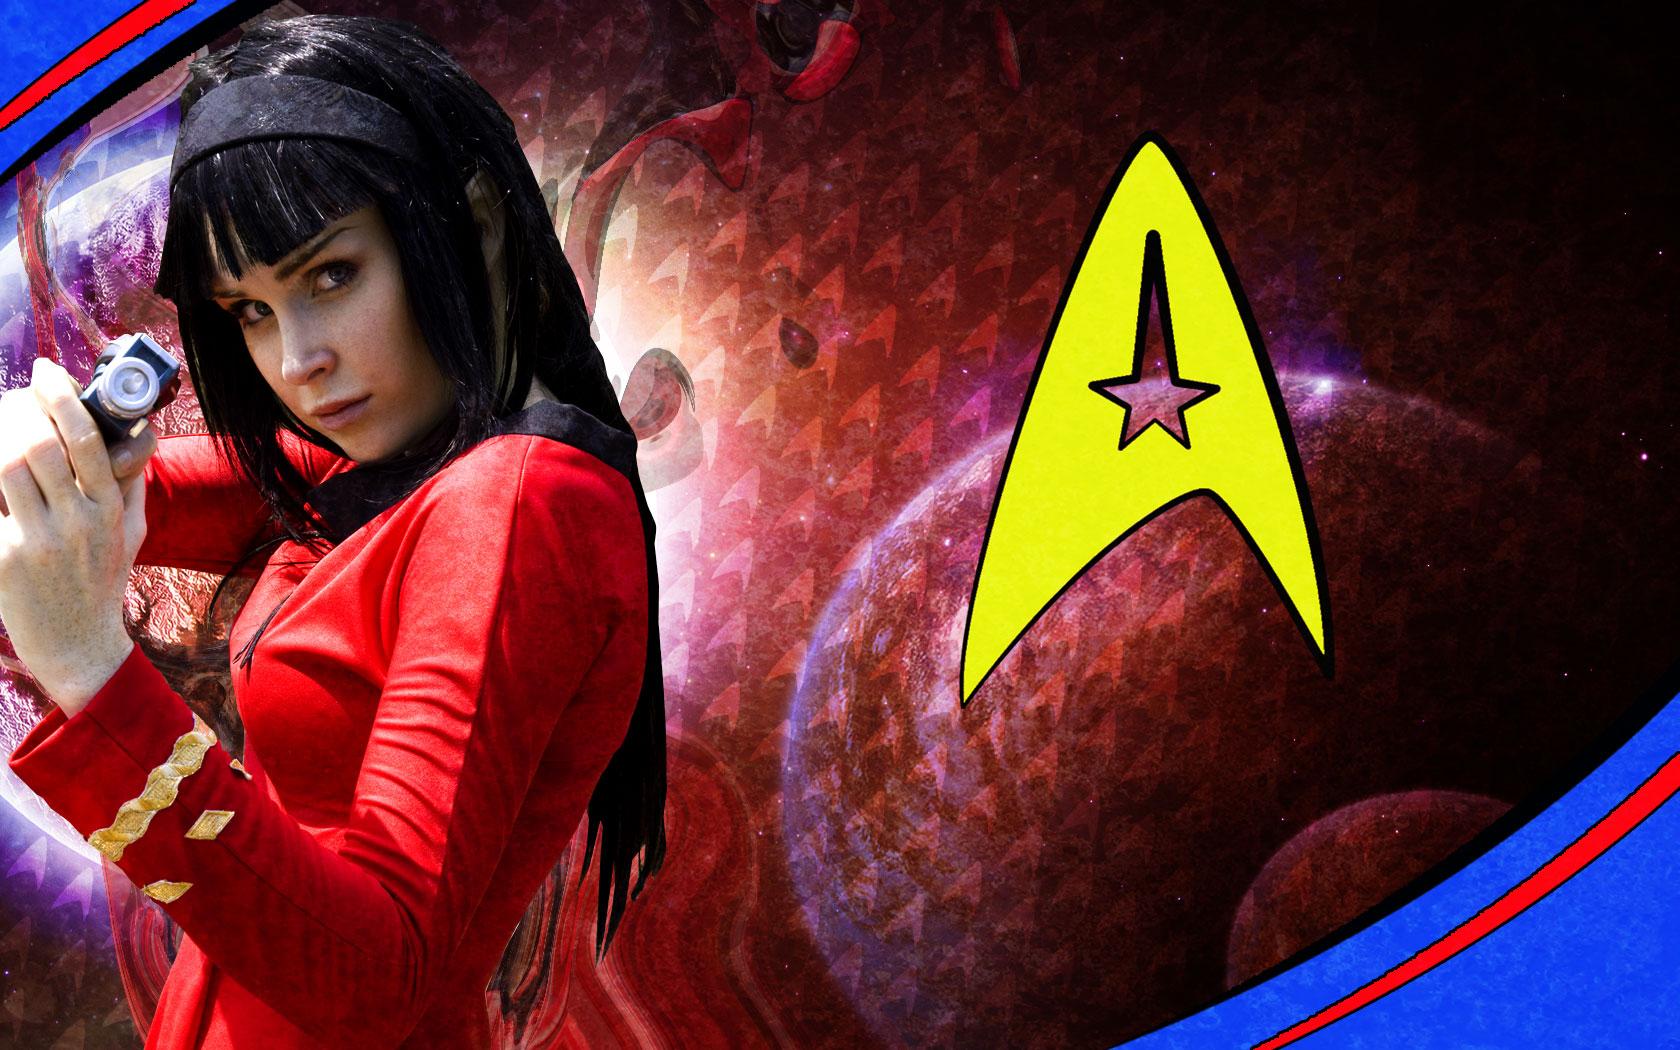 star trek tribute - red shirt by chevronguy